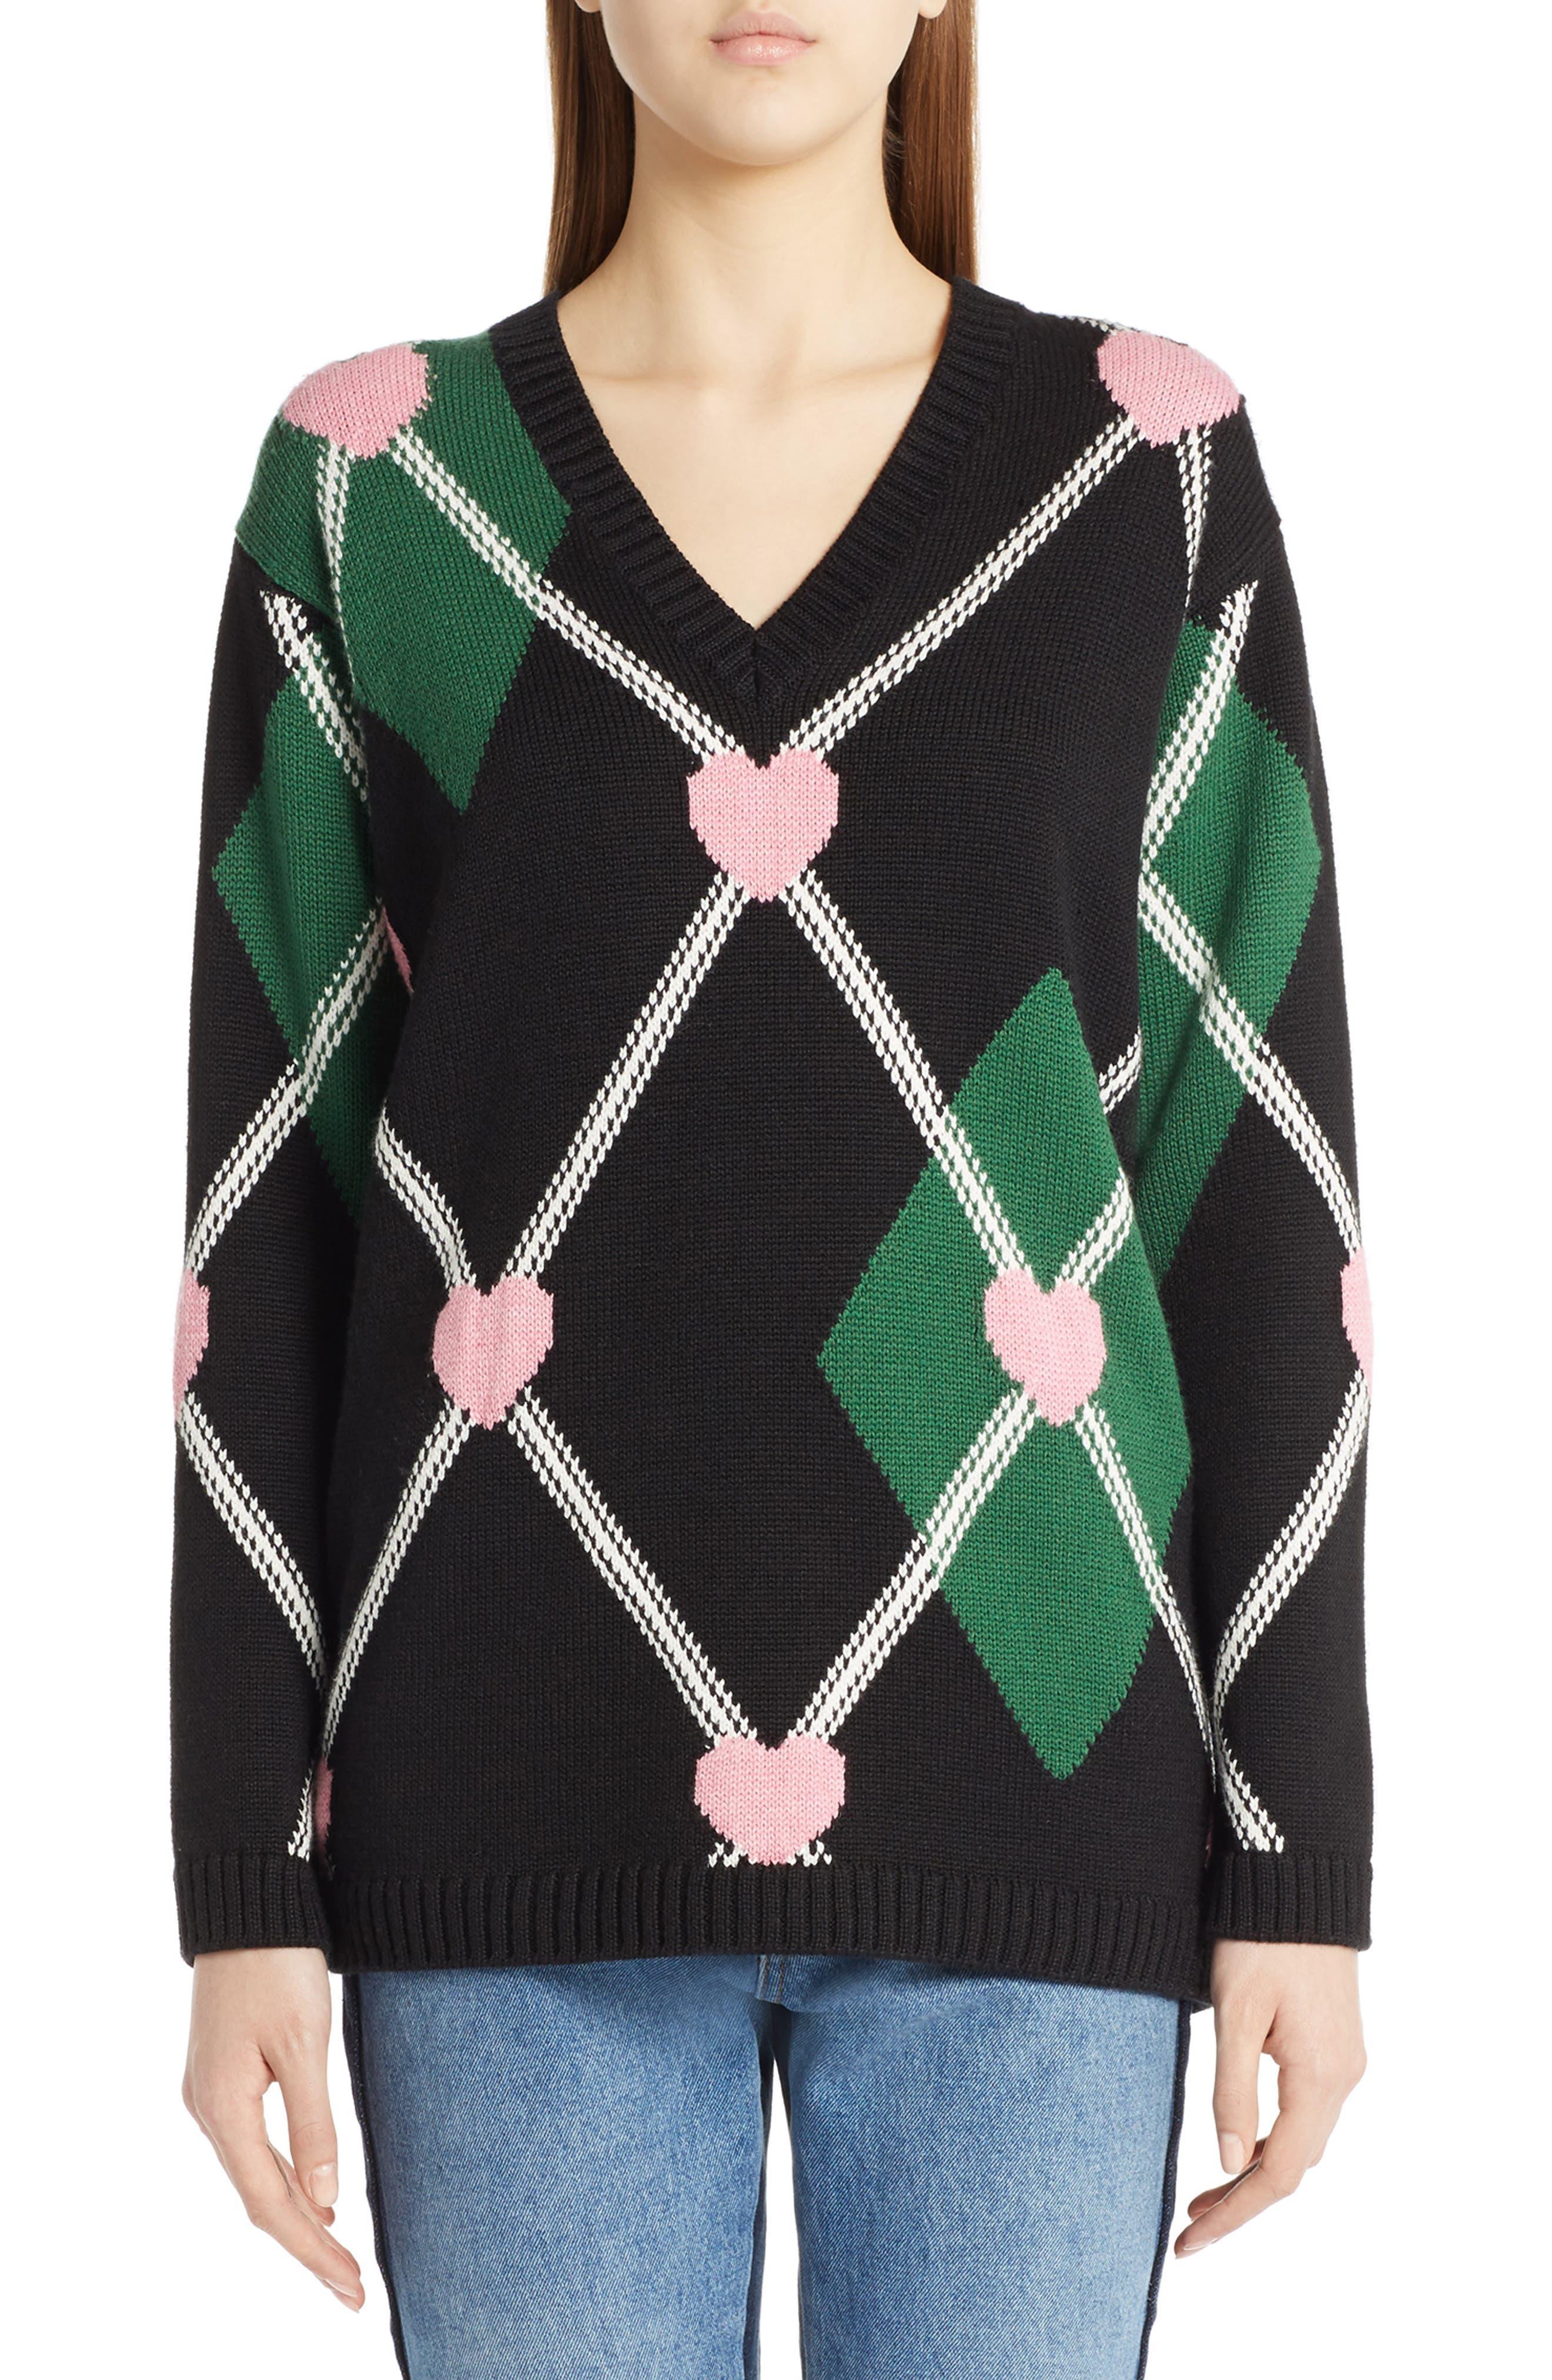 Argyle Heart Sweater,                         Main,                         color, Black